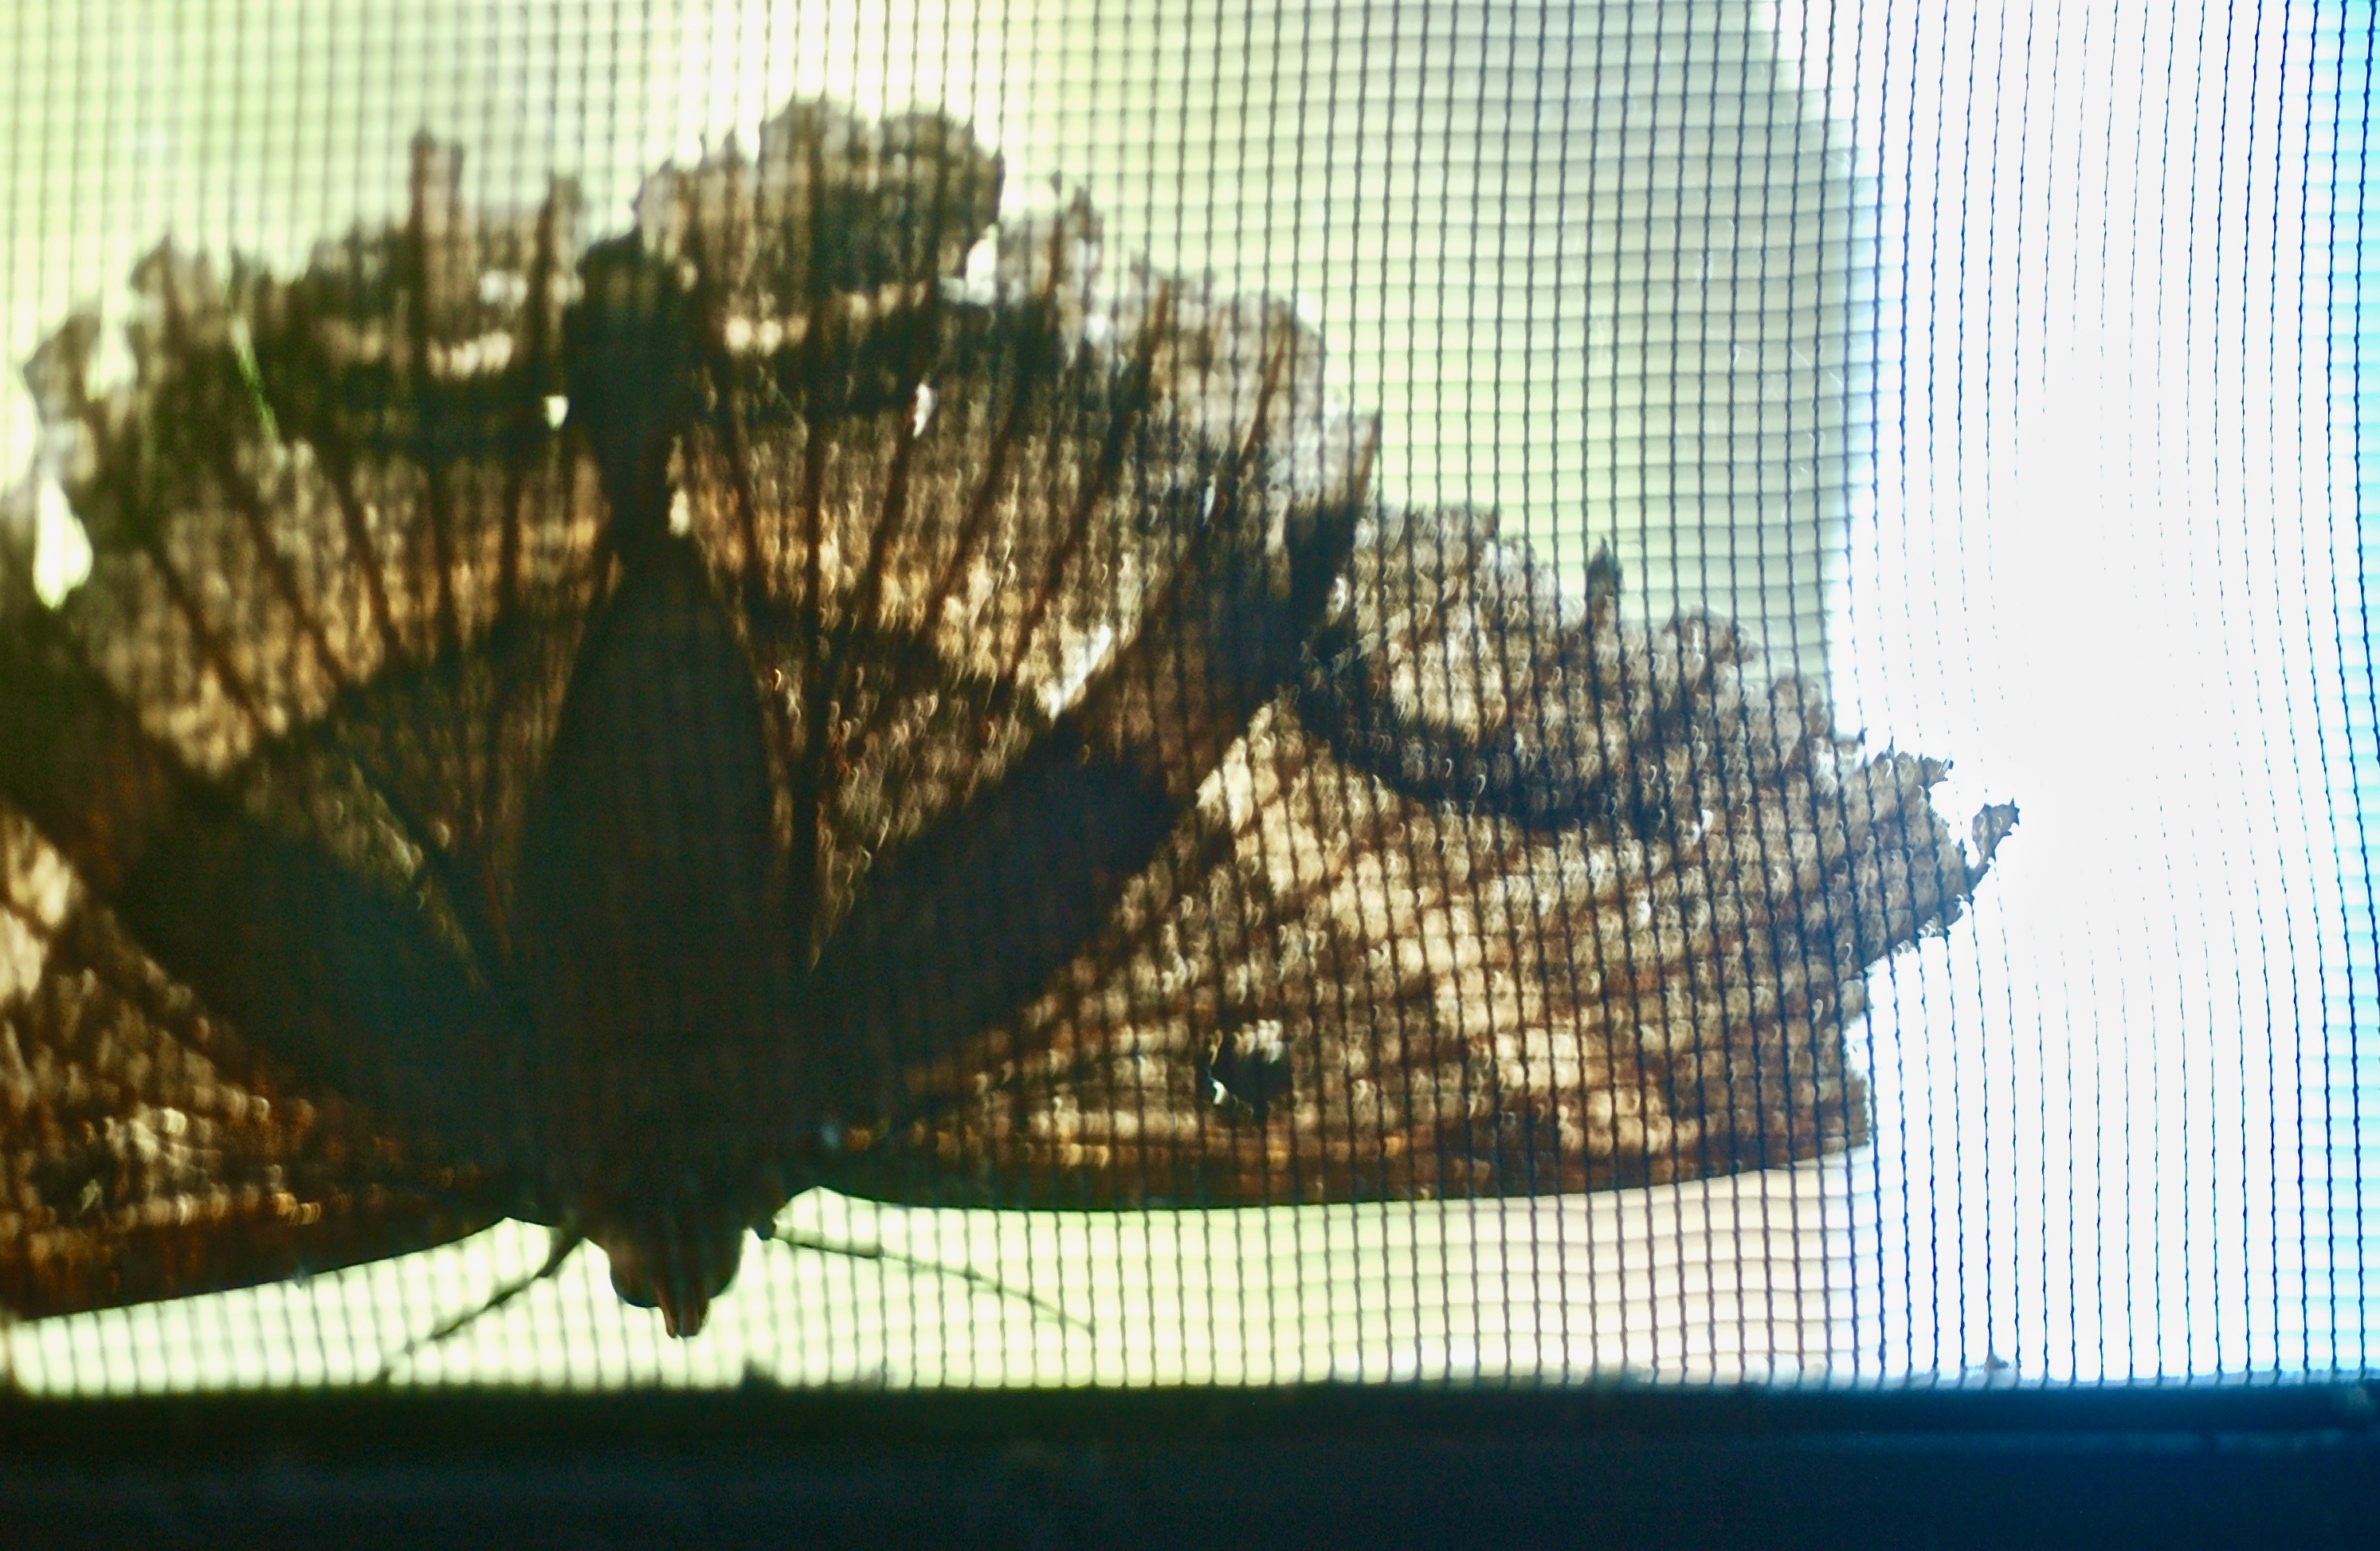 Moth in Daylight; Bordeaux Mountain; Coral Bay, St. John, U.S. Virgin Islands, USA